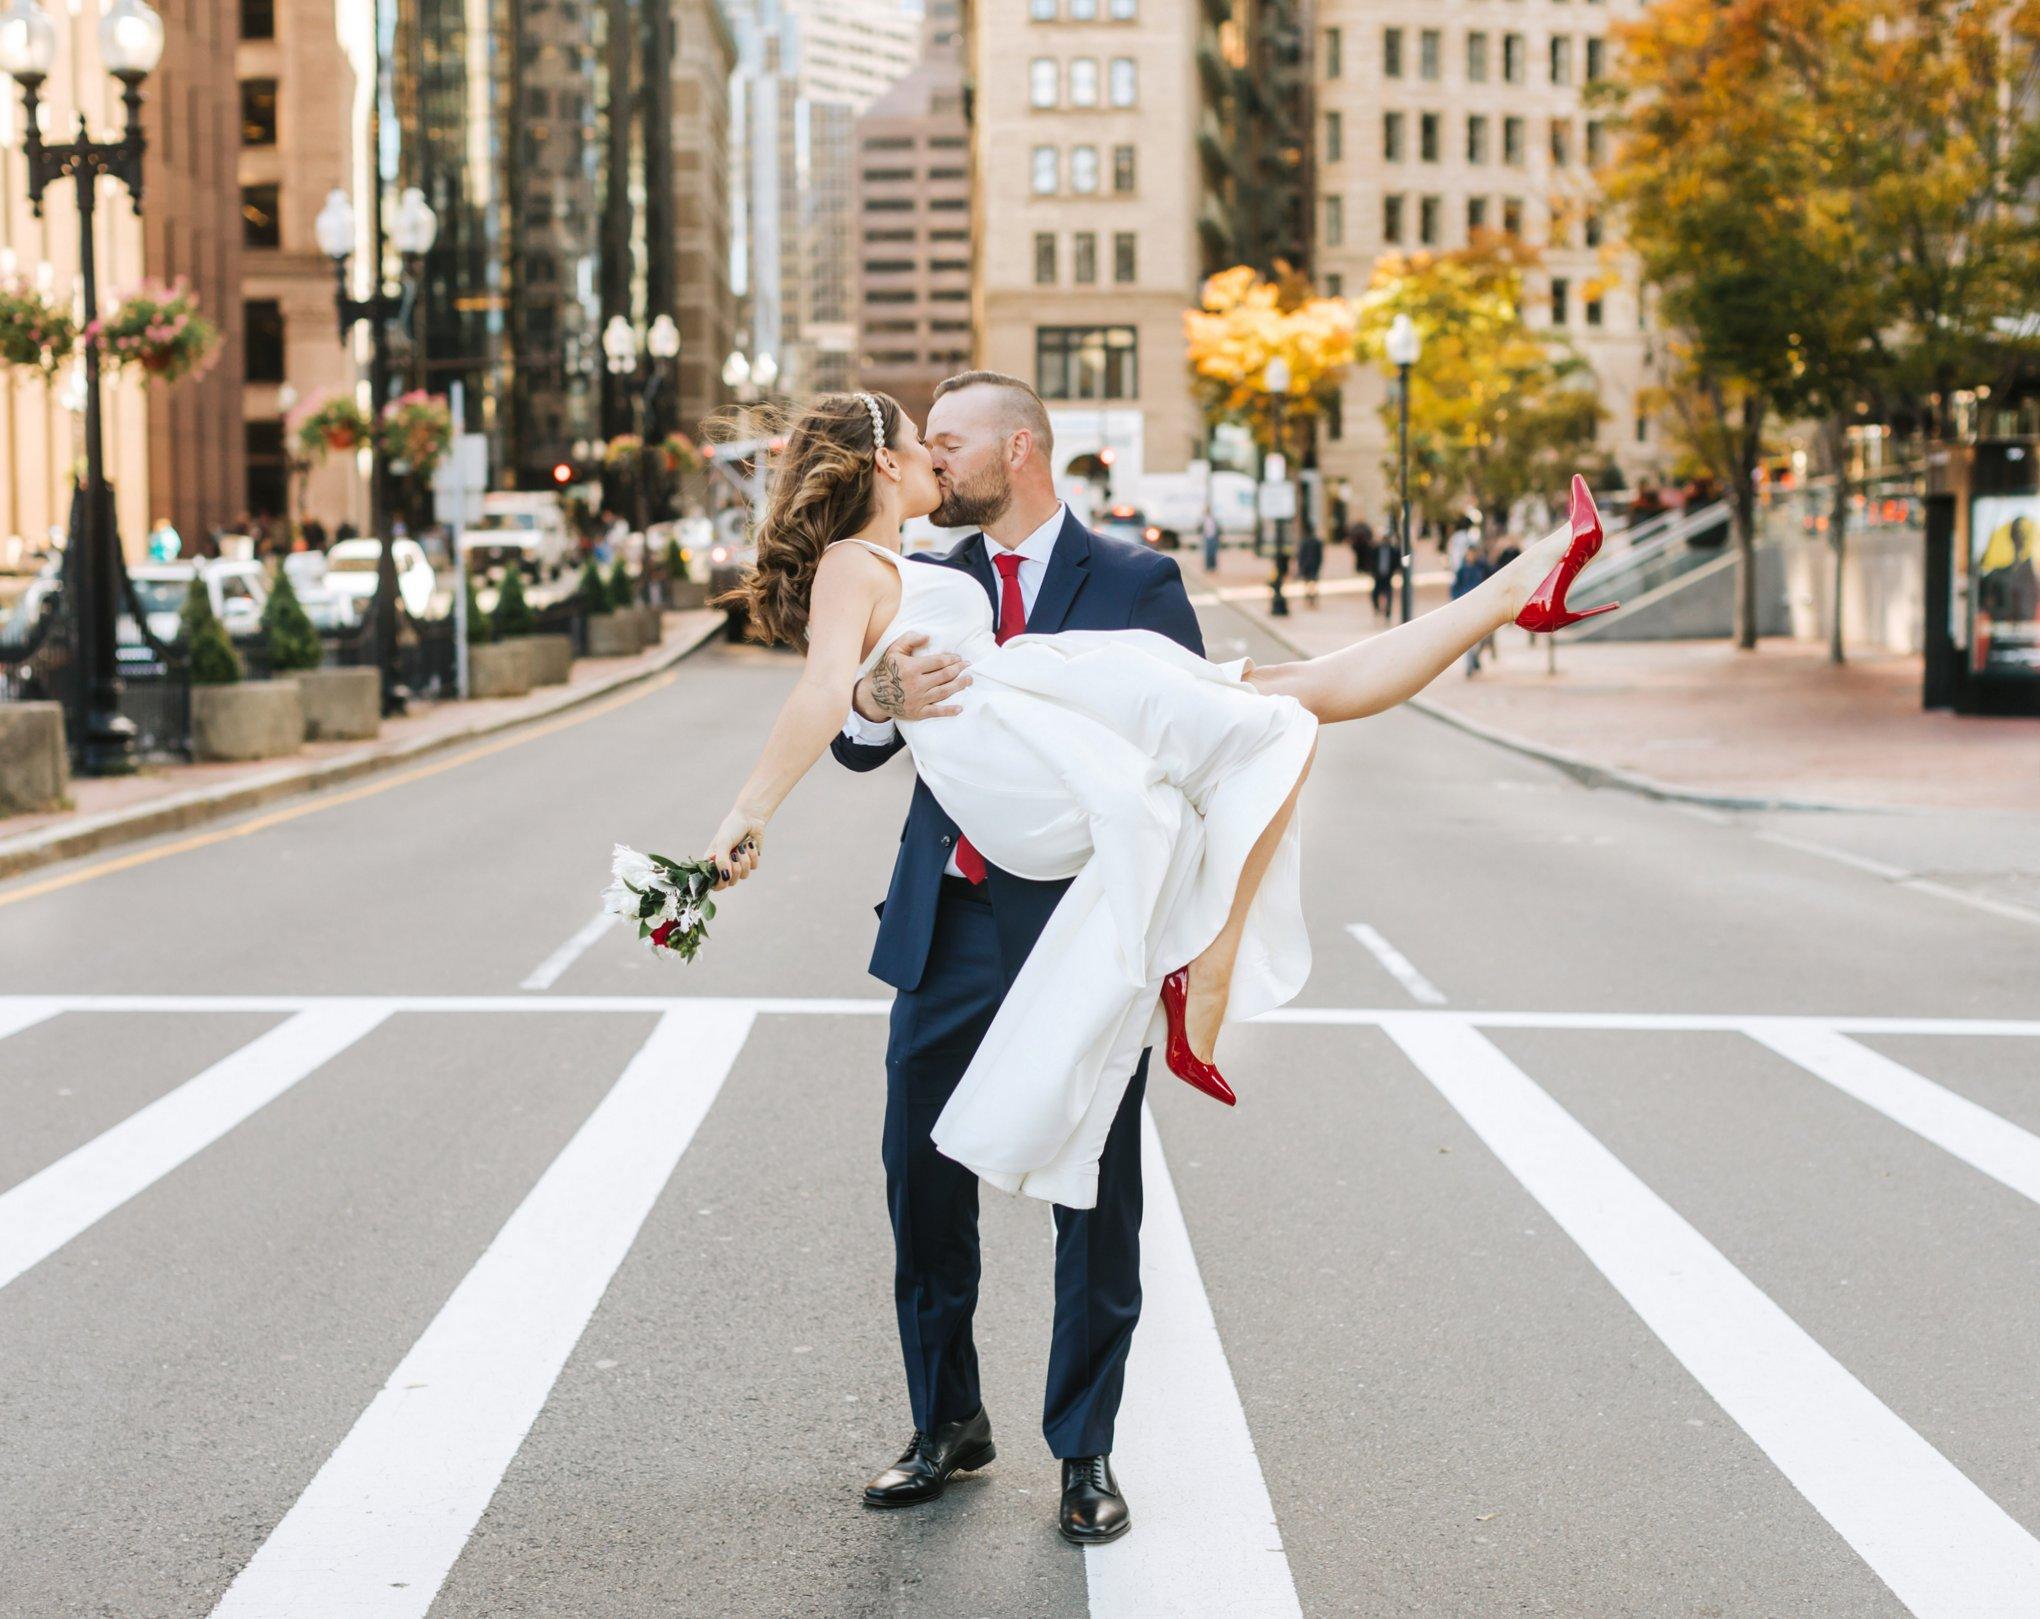 Boston-City-Hall-Wedding-Elopement-Photographer-Lena-Mirisola-7.JPG